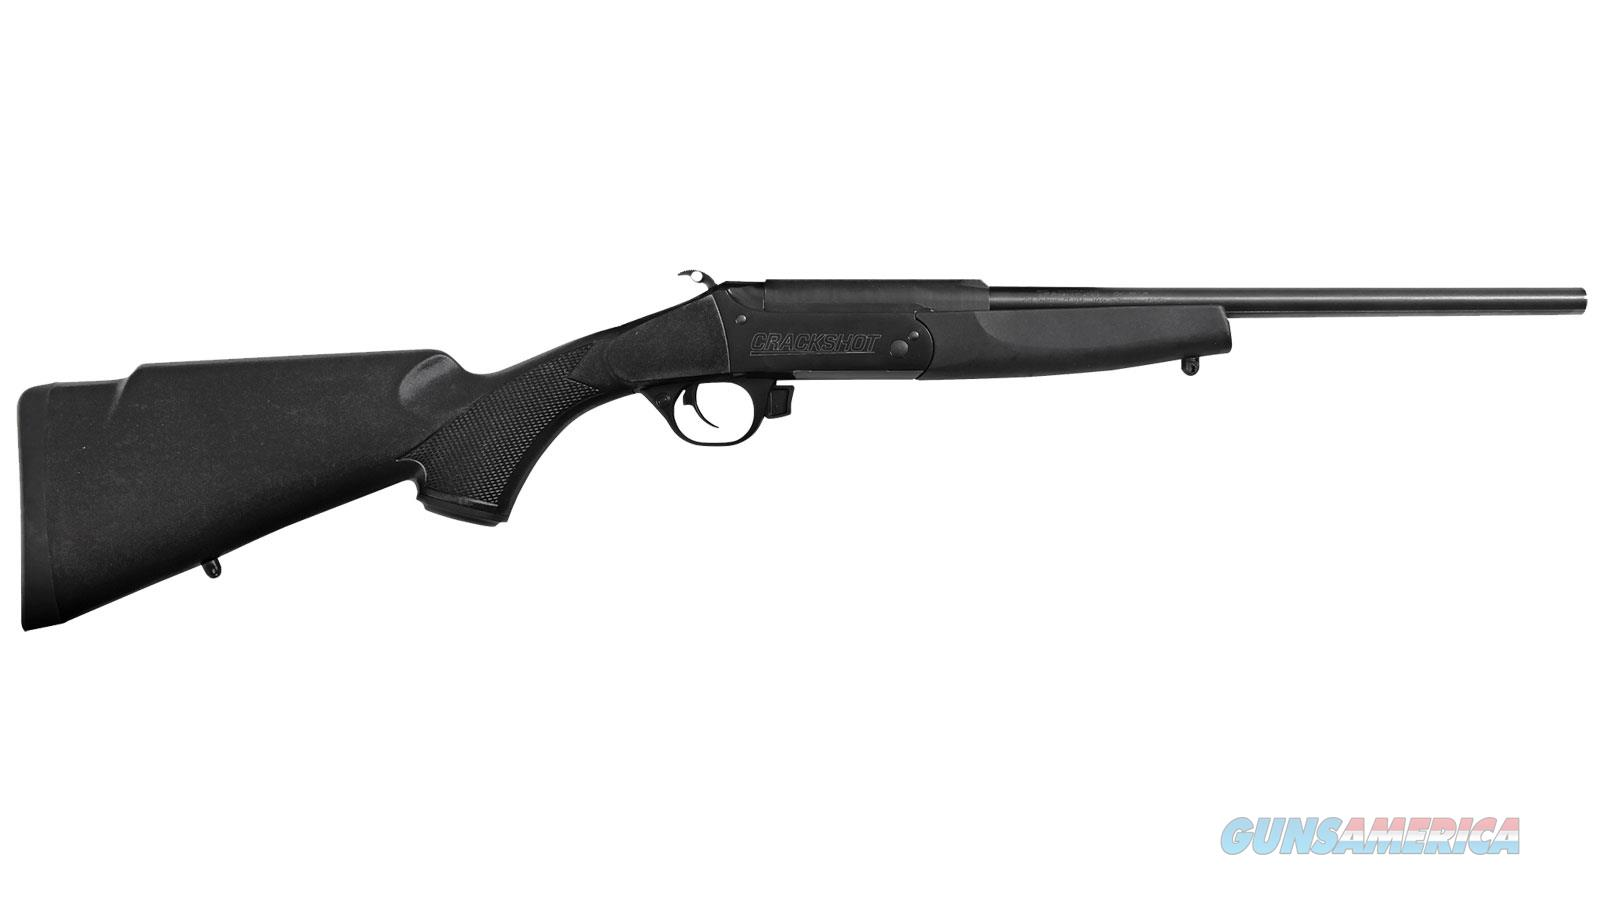 "Traditions Crackshot 22Lr 20"" 1Rd CR220000  Guns > Rifles > Traditions Rifles"